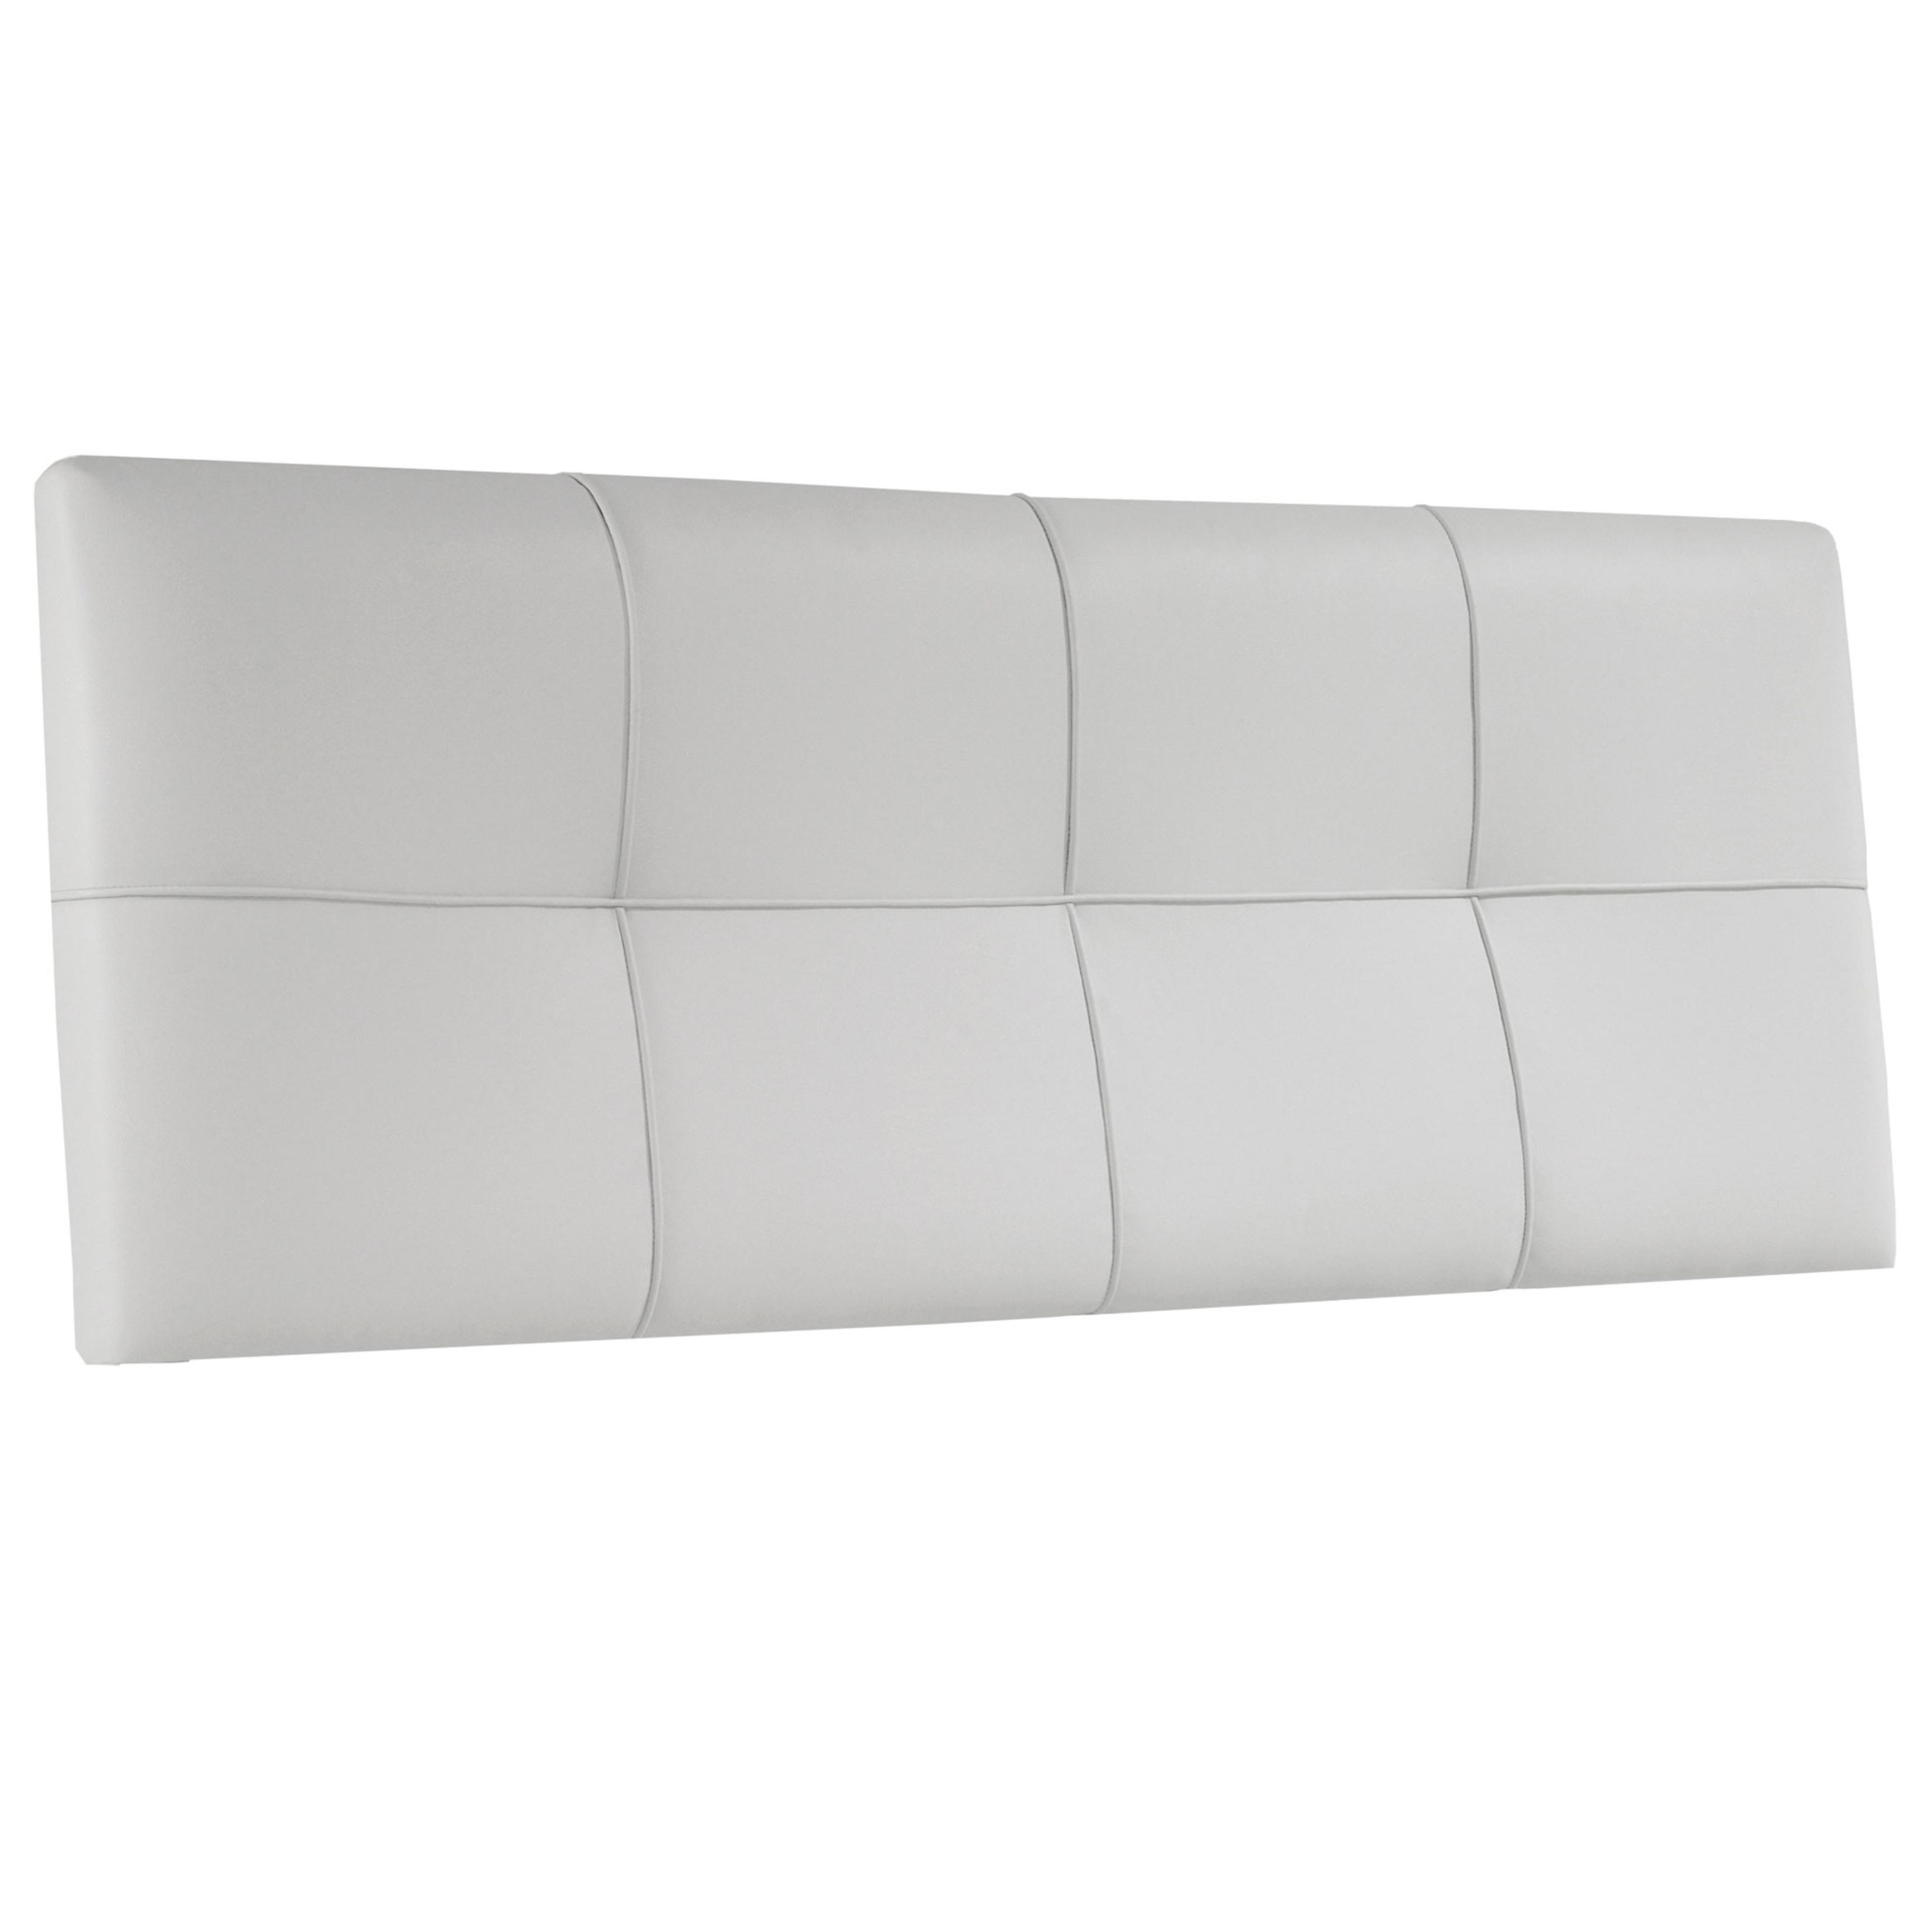 29522-cabecero-tapizado-160-simil-piel-blanco.jpeg